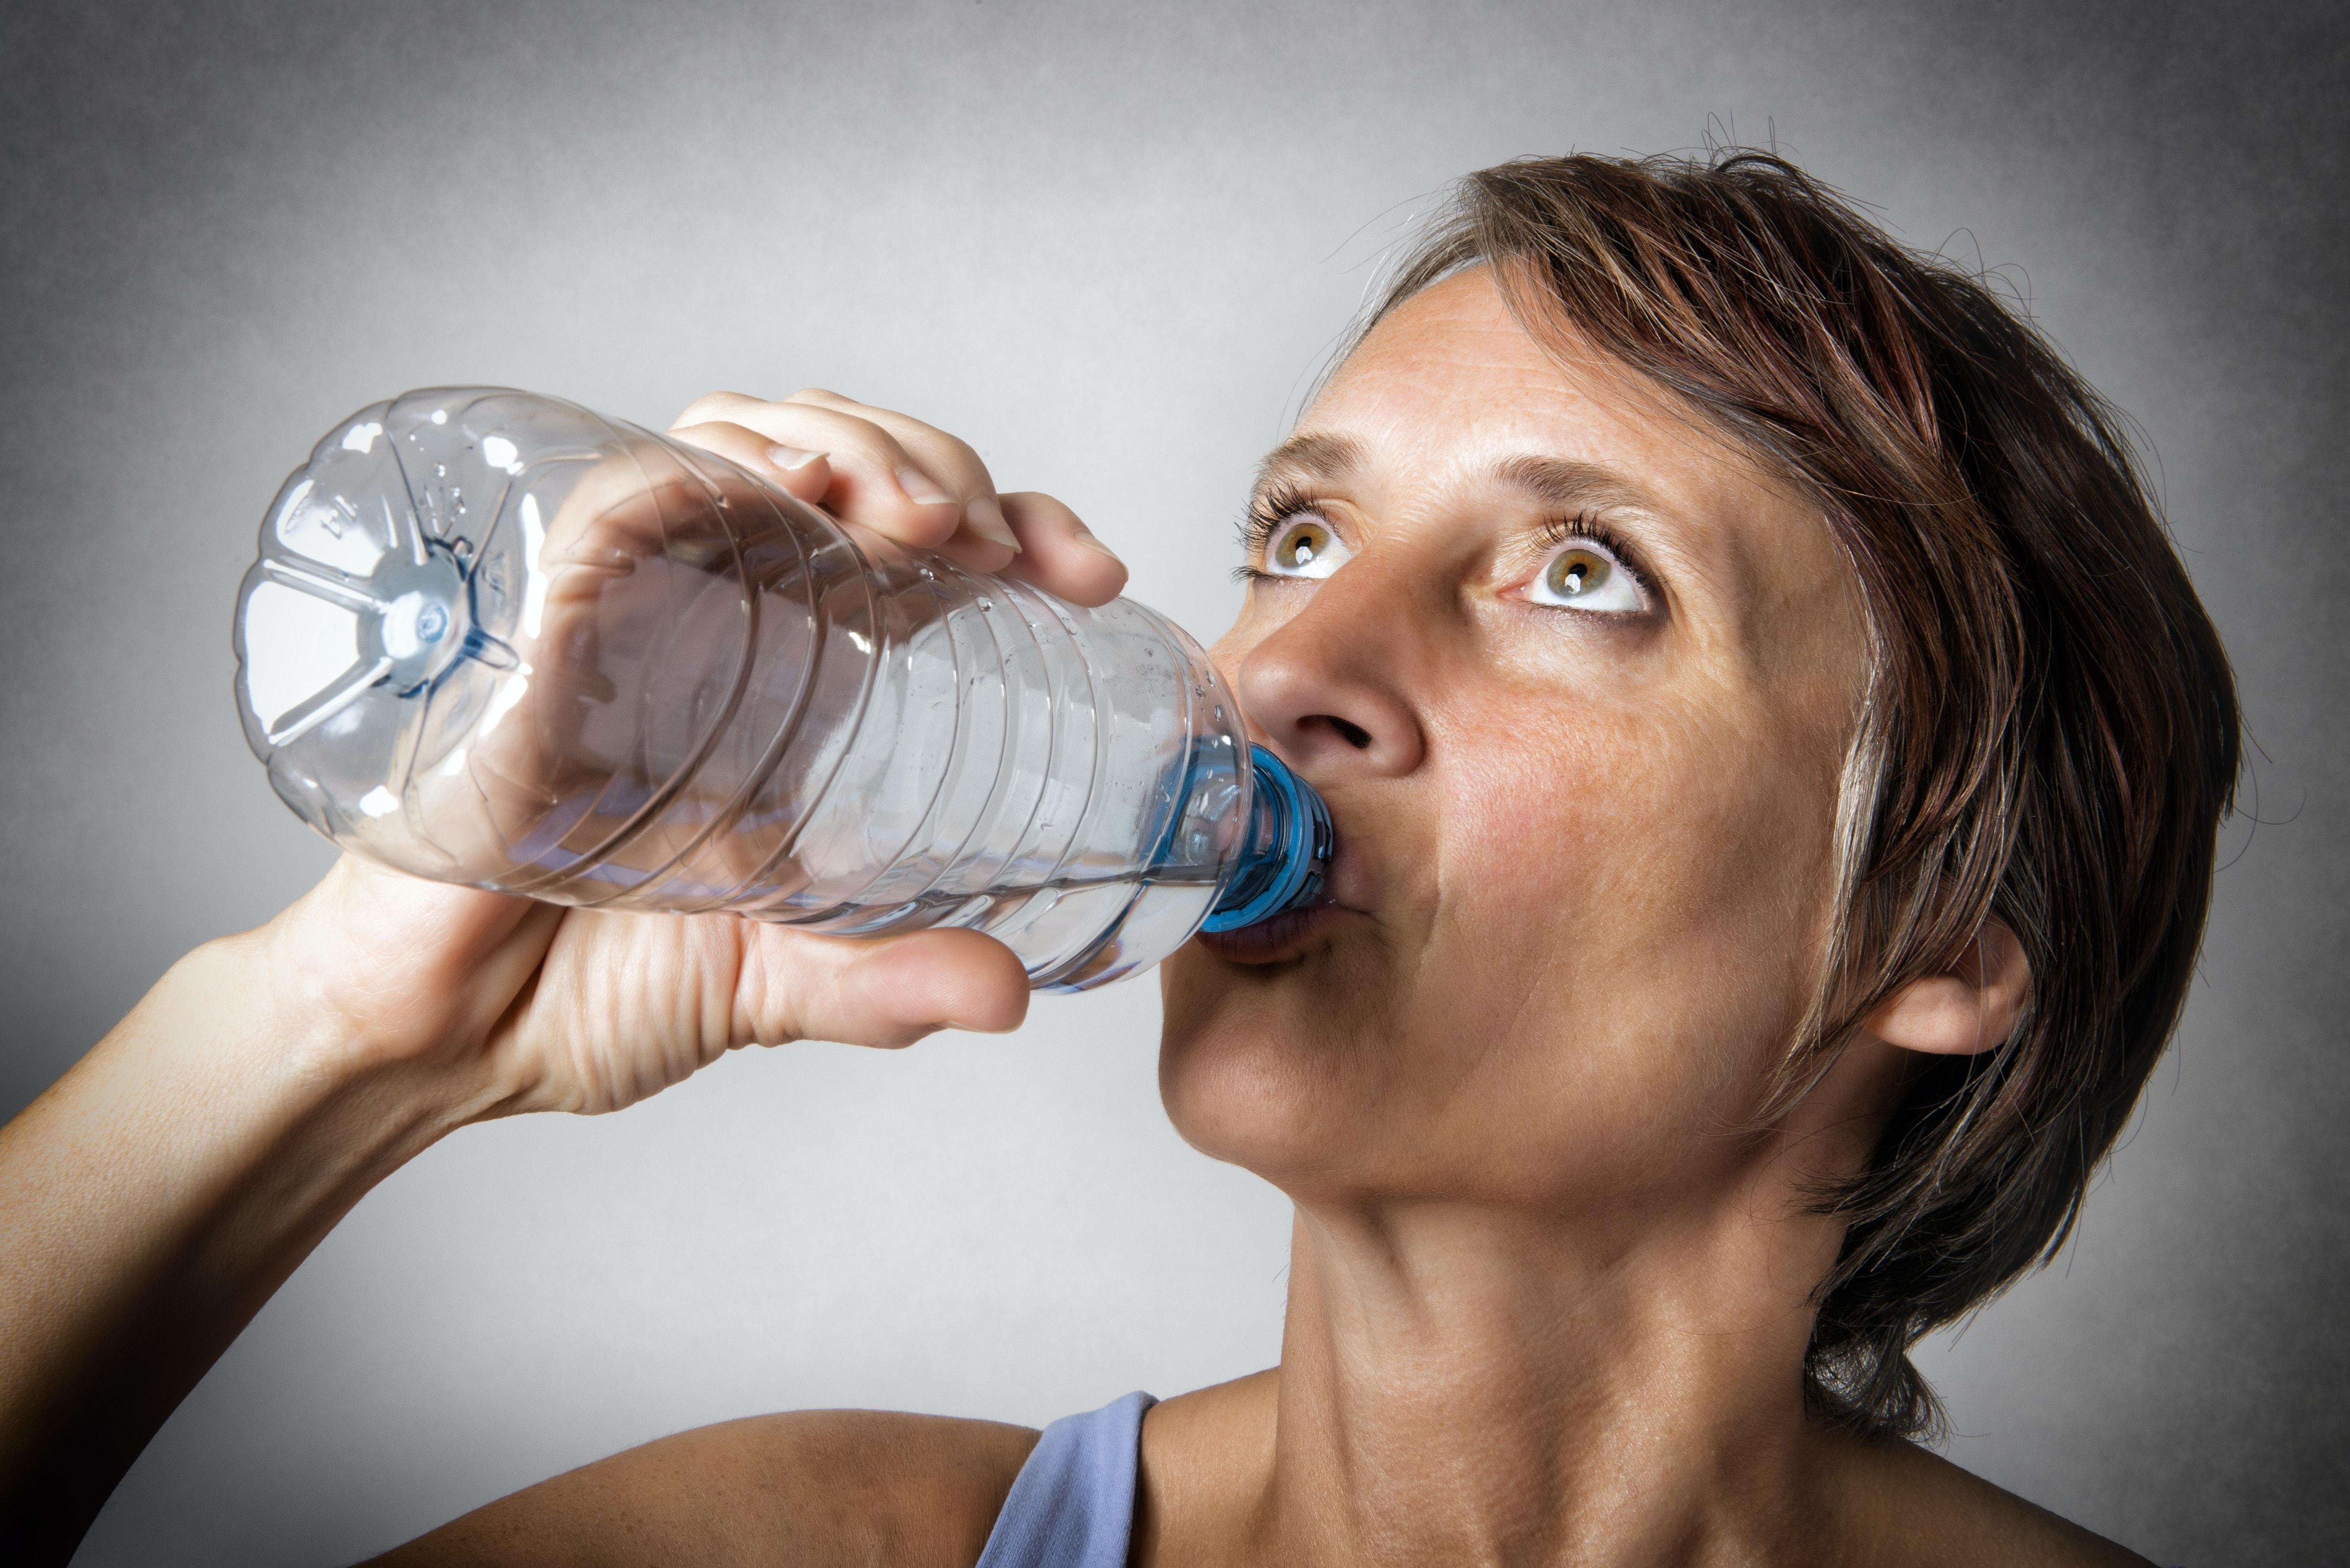 overgangsalder og slankekur